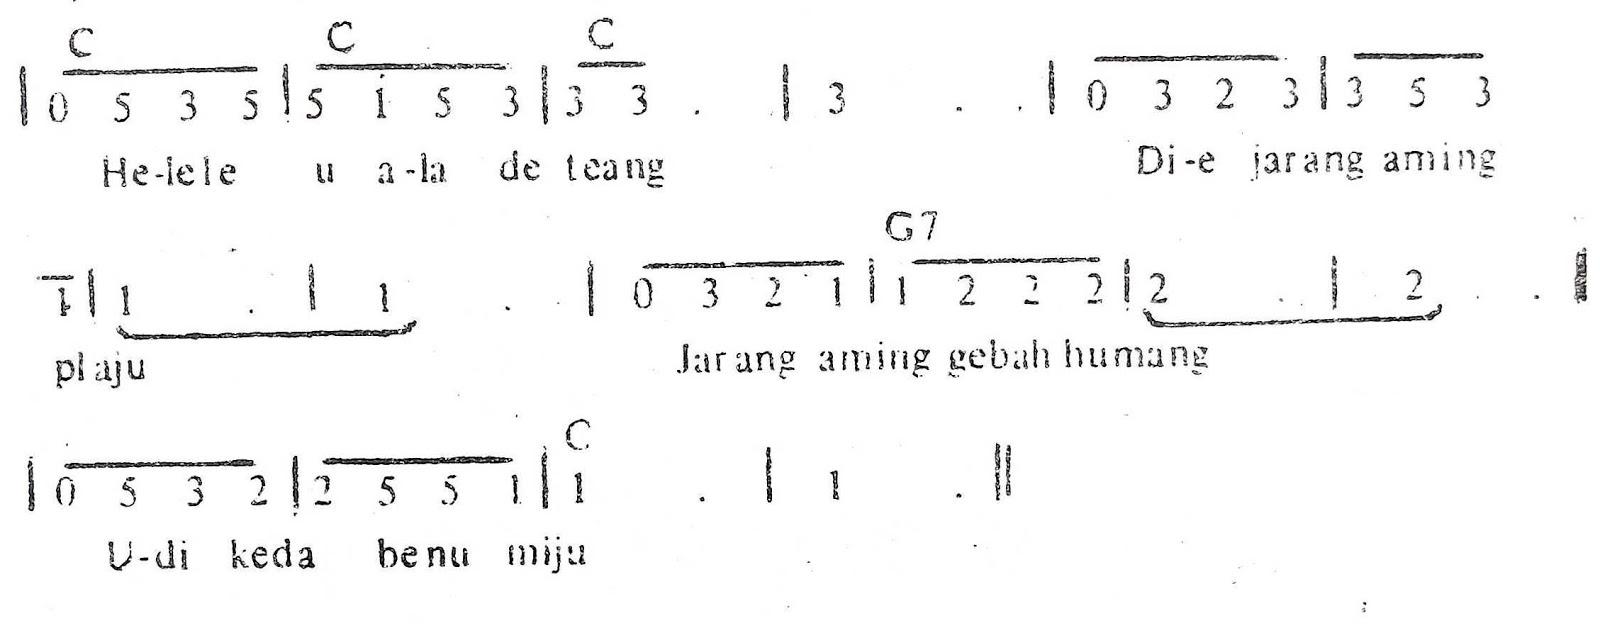 Chord + Not Angka & Arti Lirik Lagu Helele U Ala De Teang: Nusa Tenggara Timur